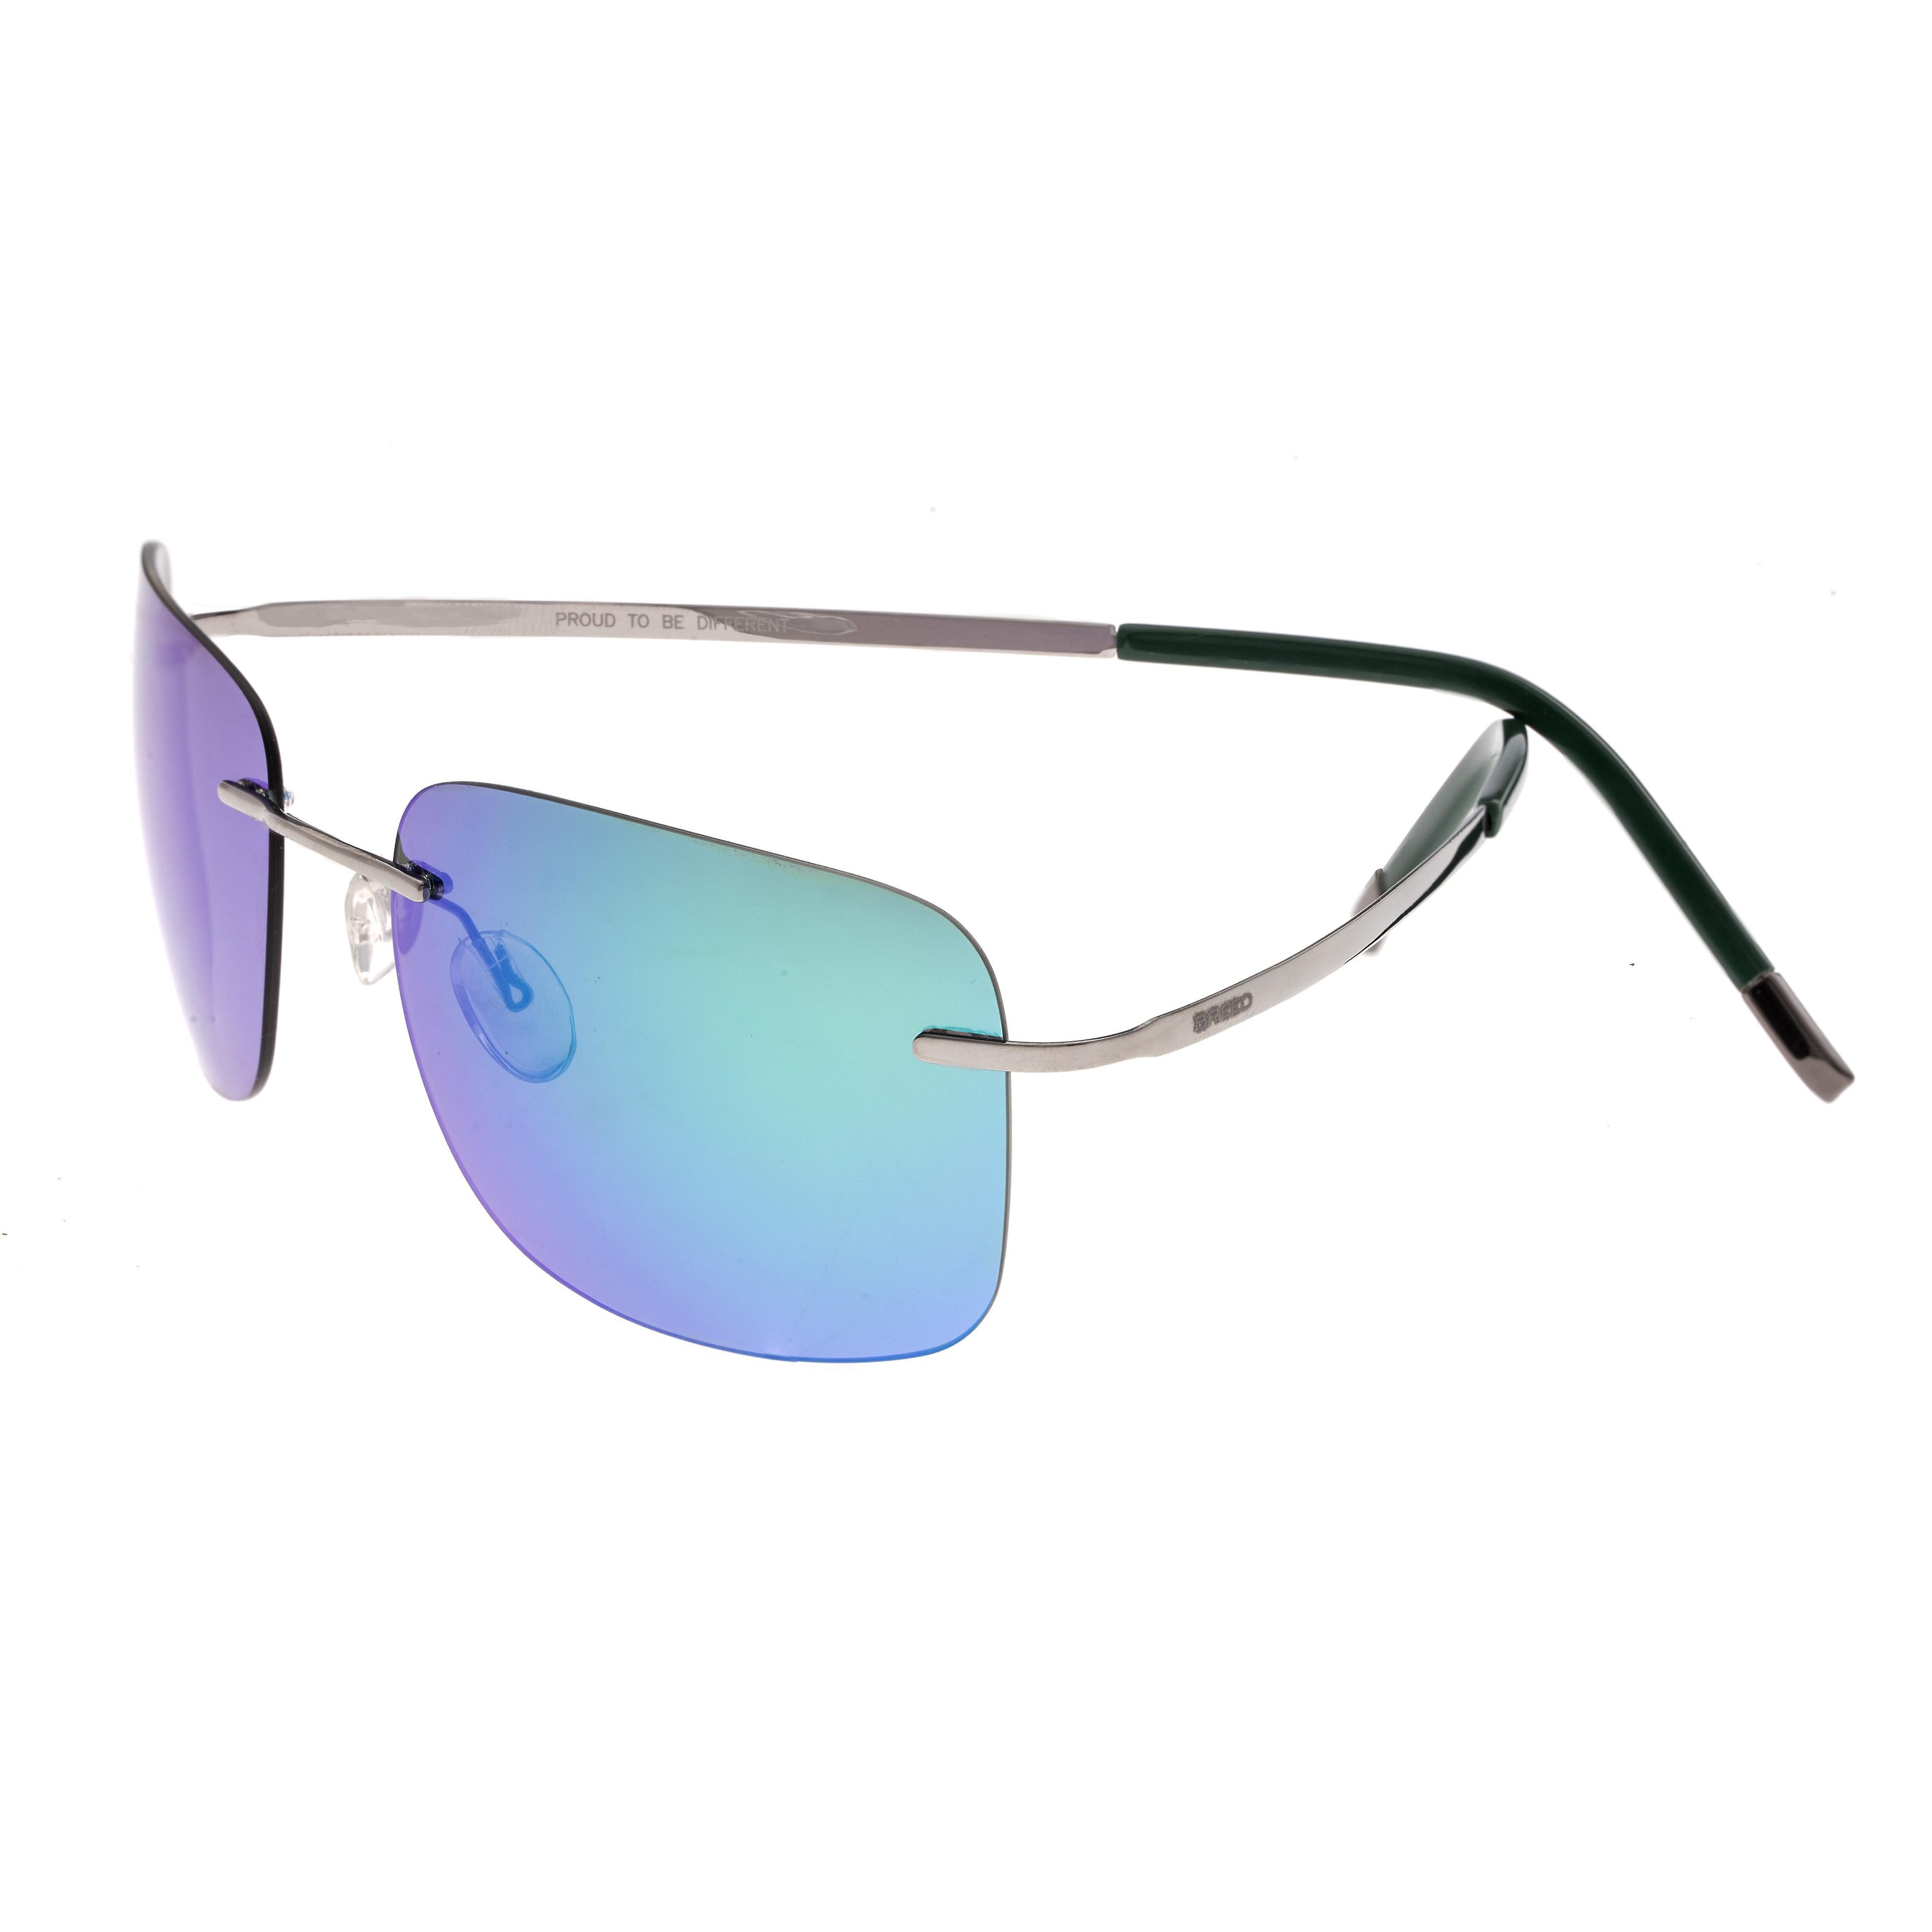 Breed Orbit Titanium Polarized Sunglasses - Gunmetal bleu-vert